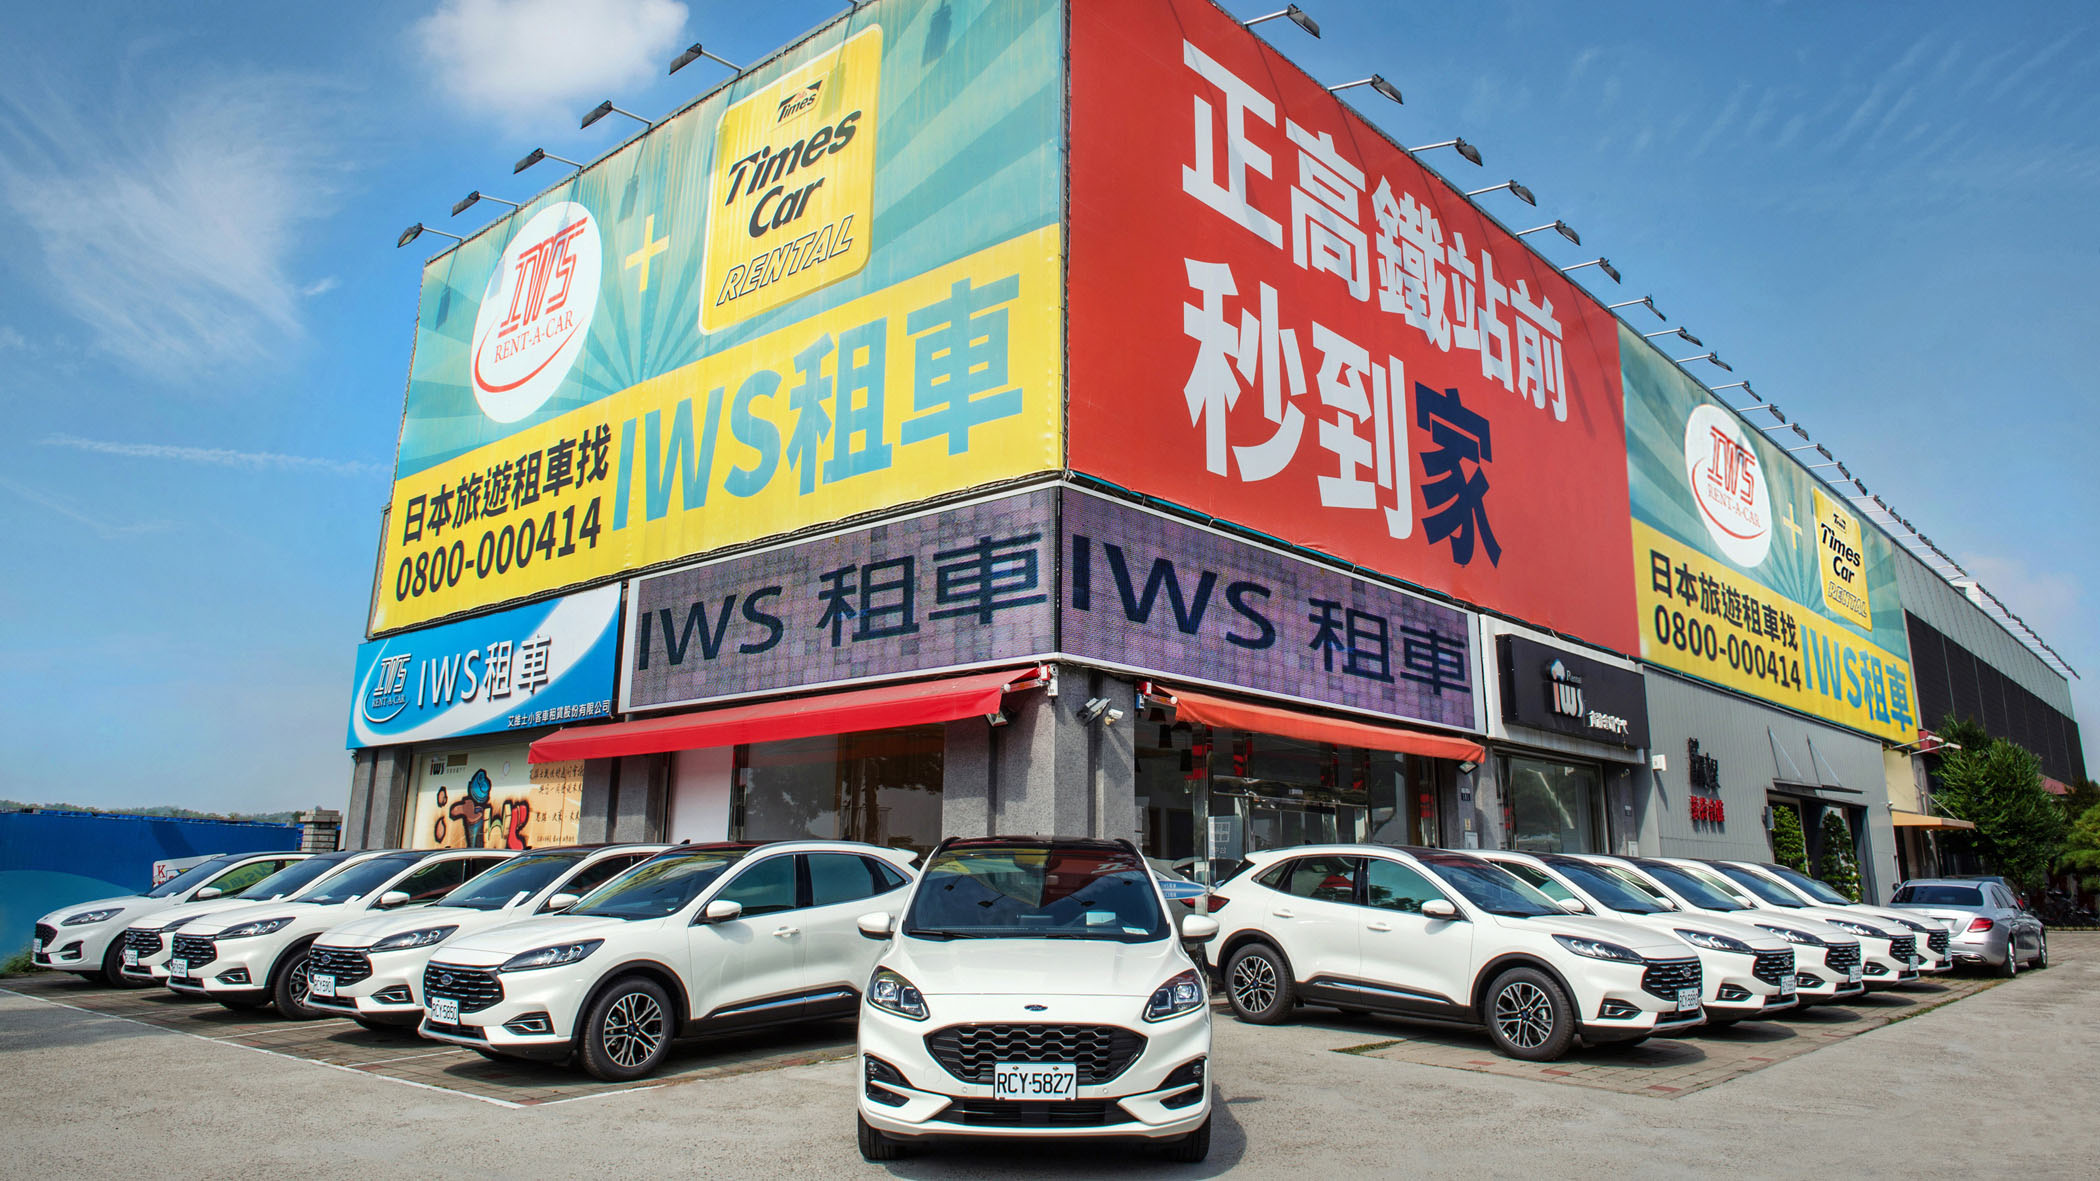 Ford Kuga 雙車款進駐 IWS 租車,平日租金 65 折